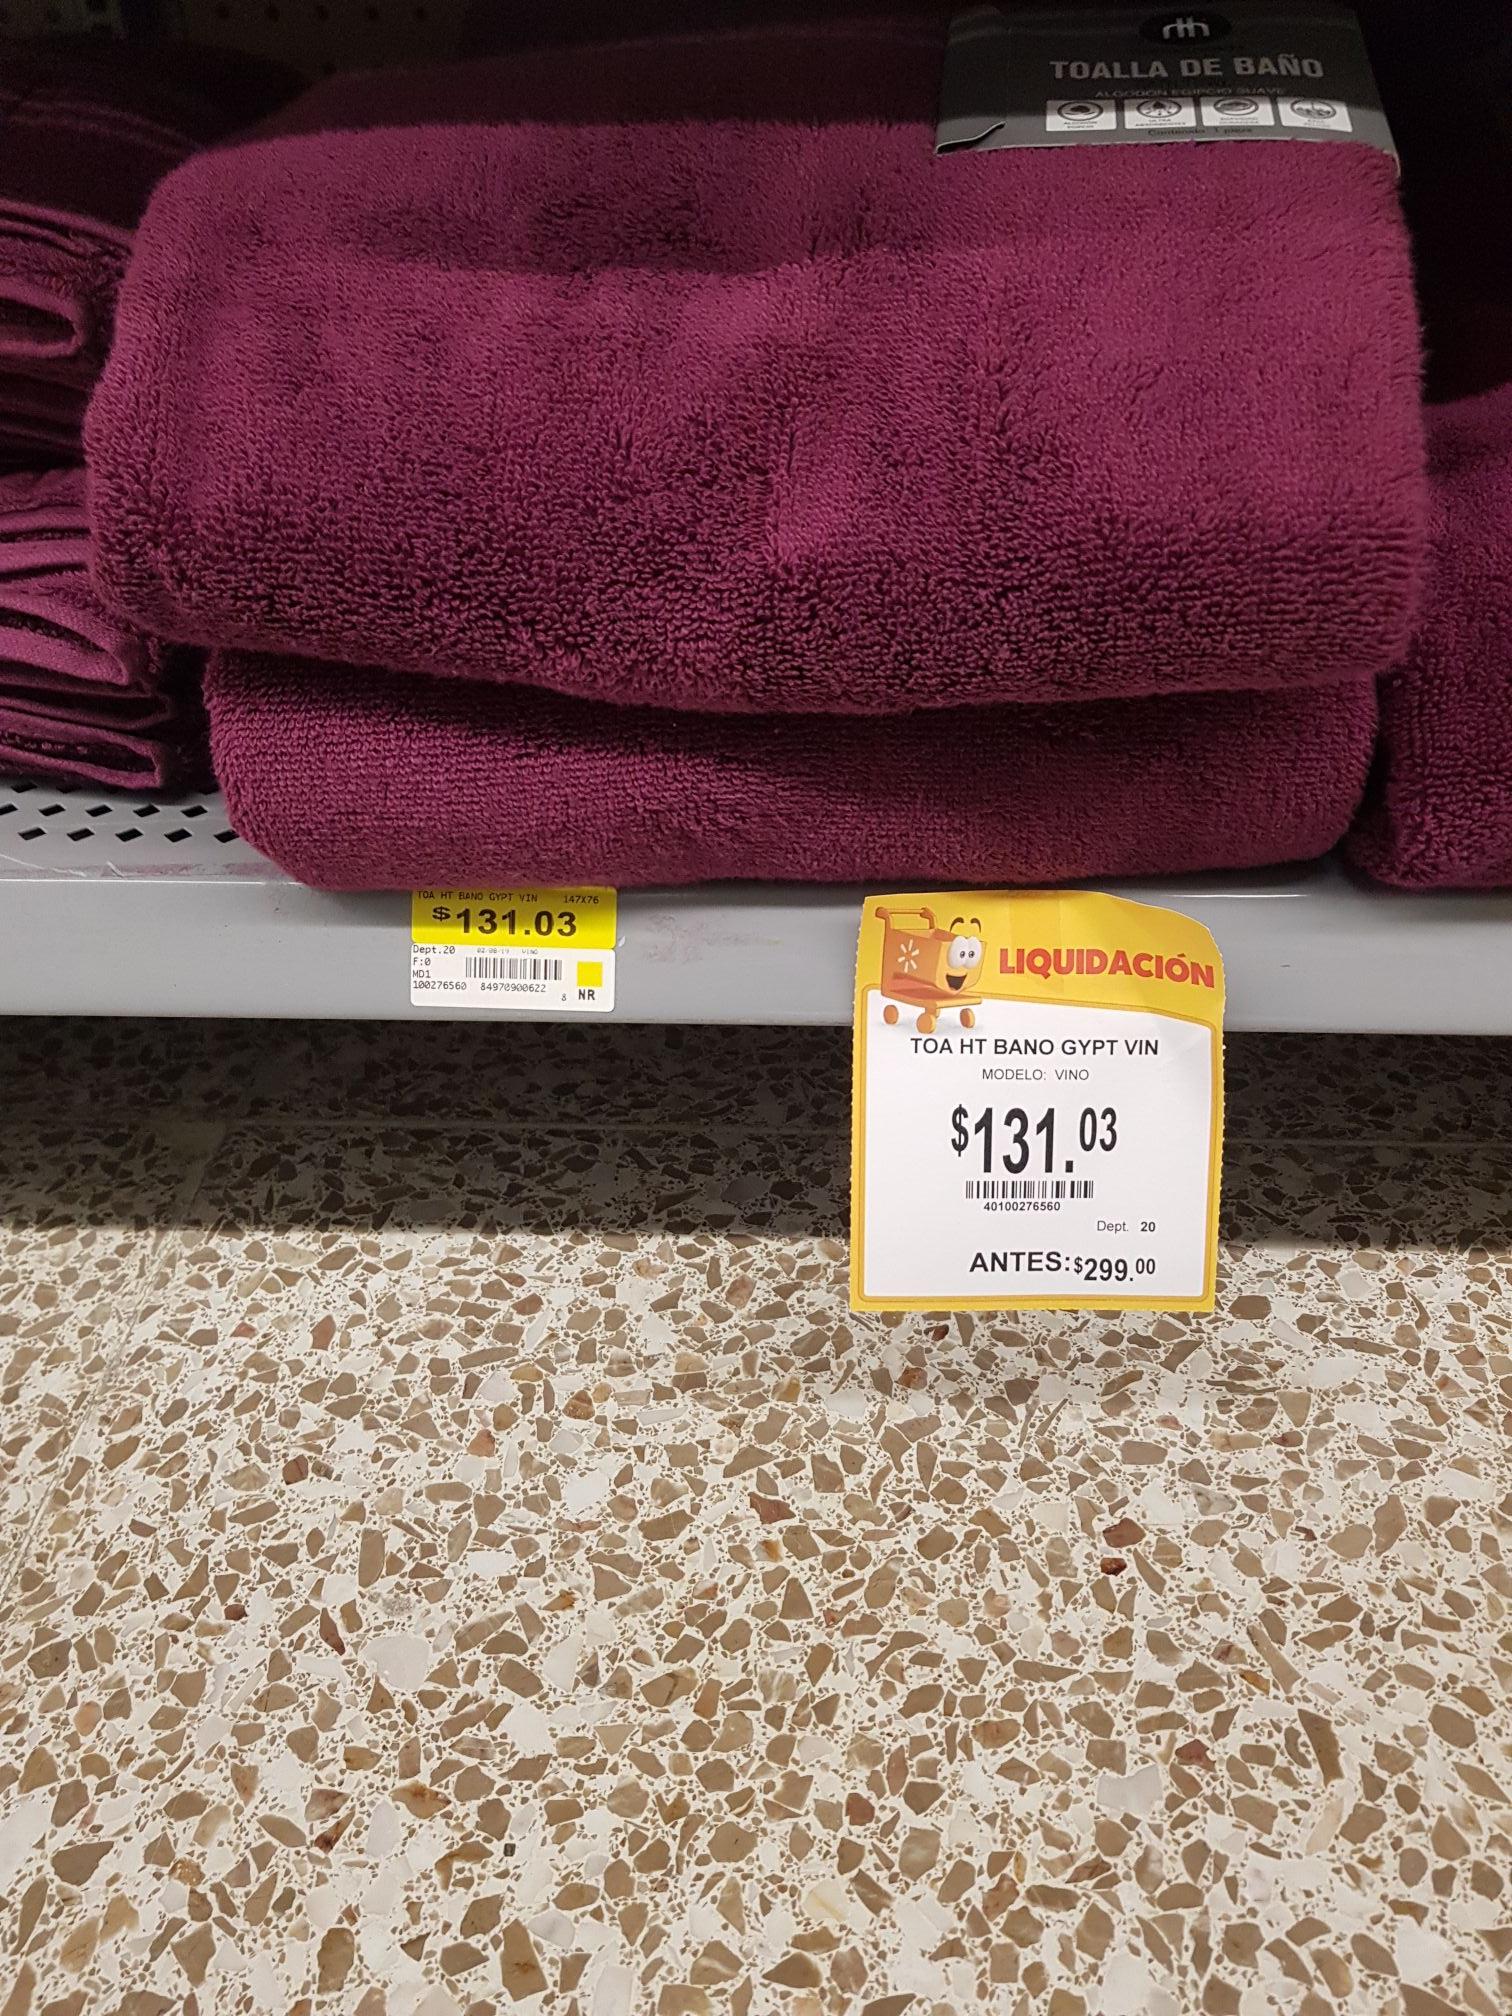 Walmart: Toalla de Baño. Home Trends. Liquidación.